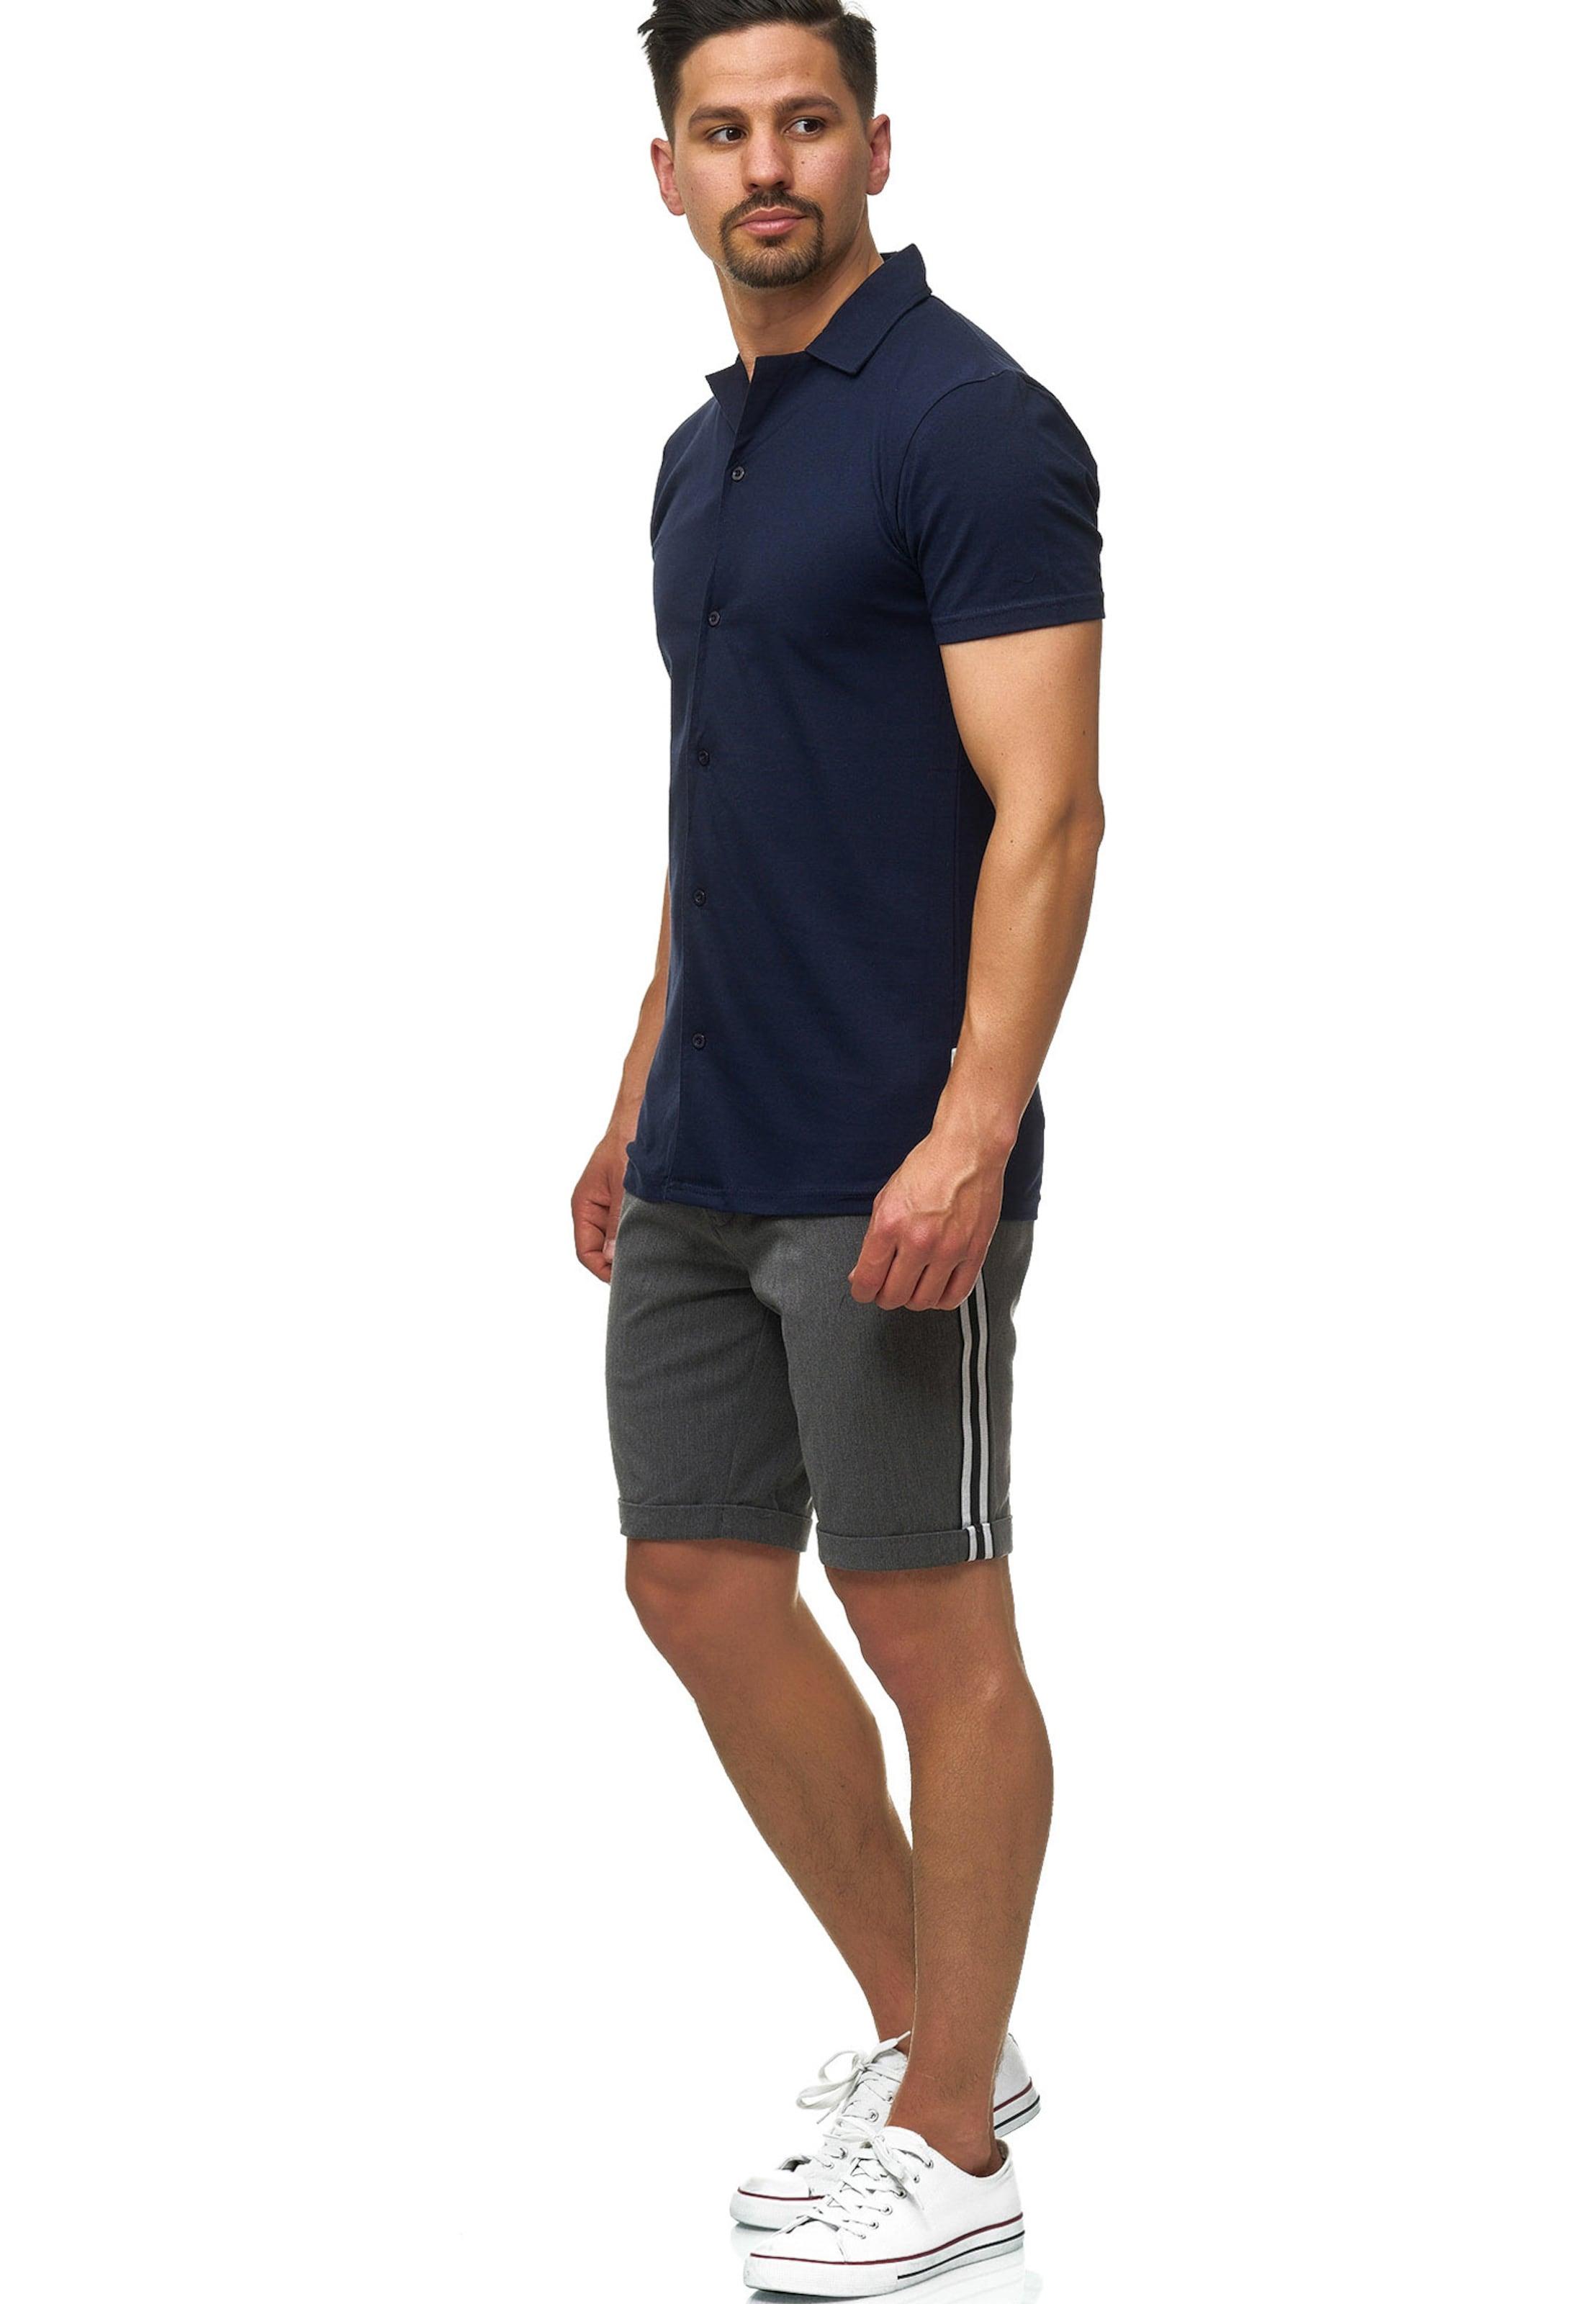 En Indicode Gentiane Chemise 'biggerstaff' Jeans 8Nwk0XnOP